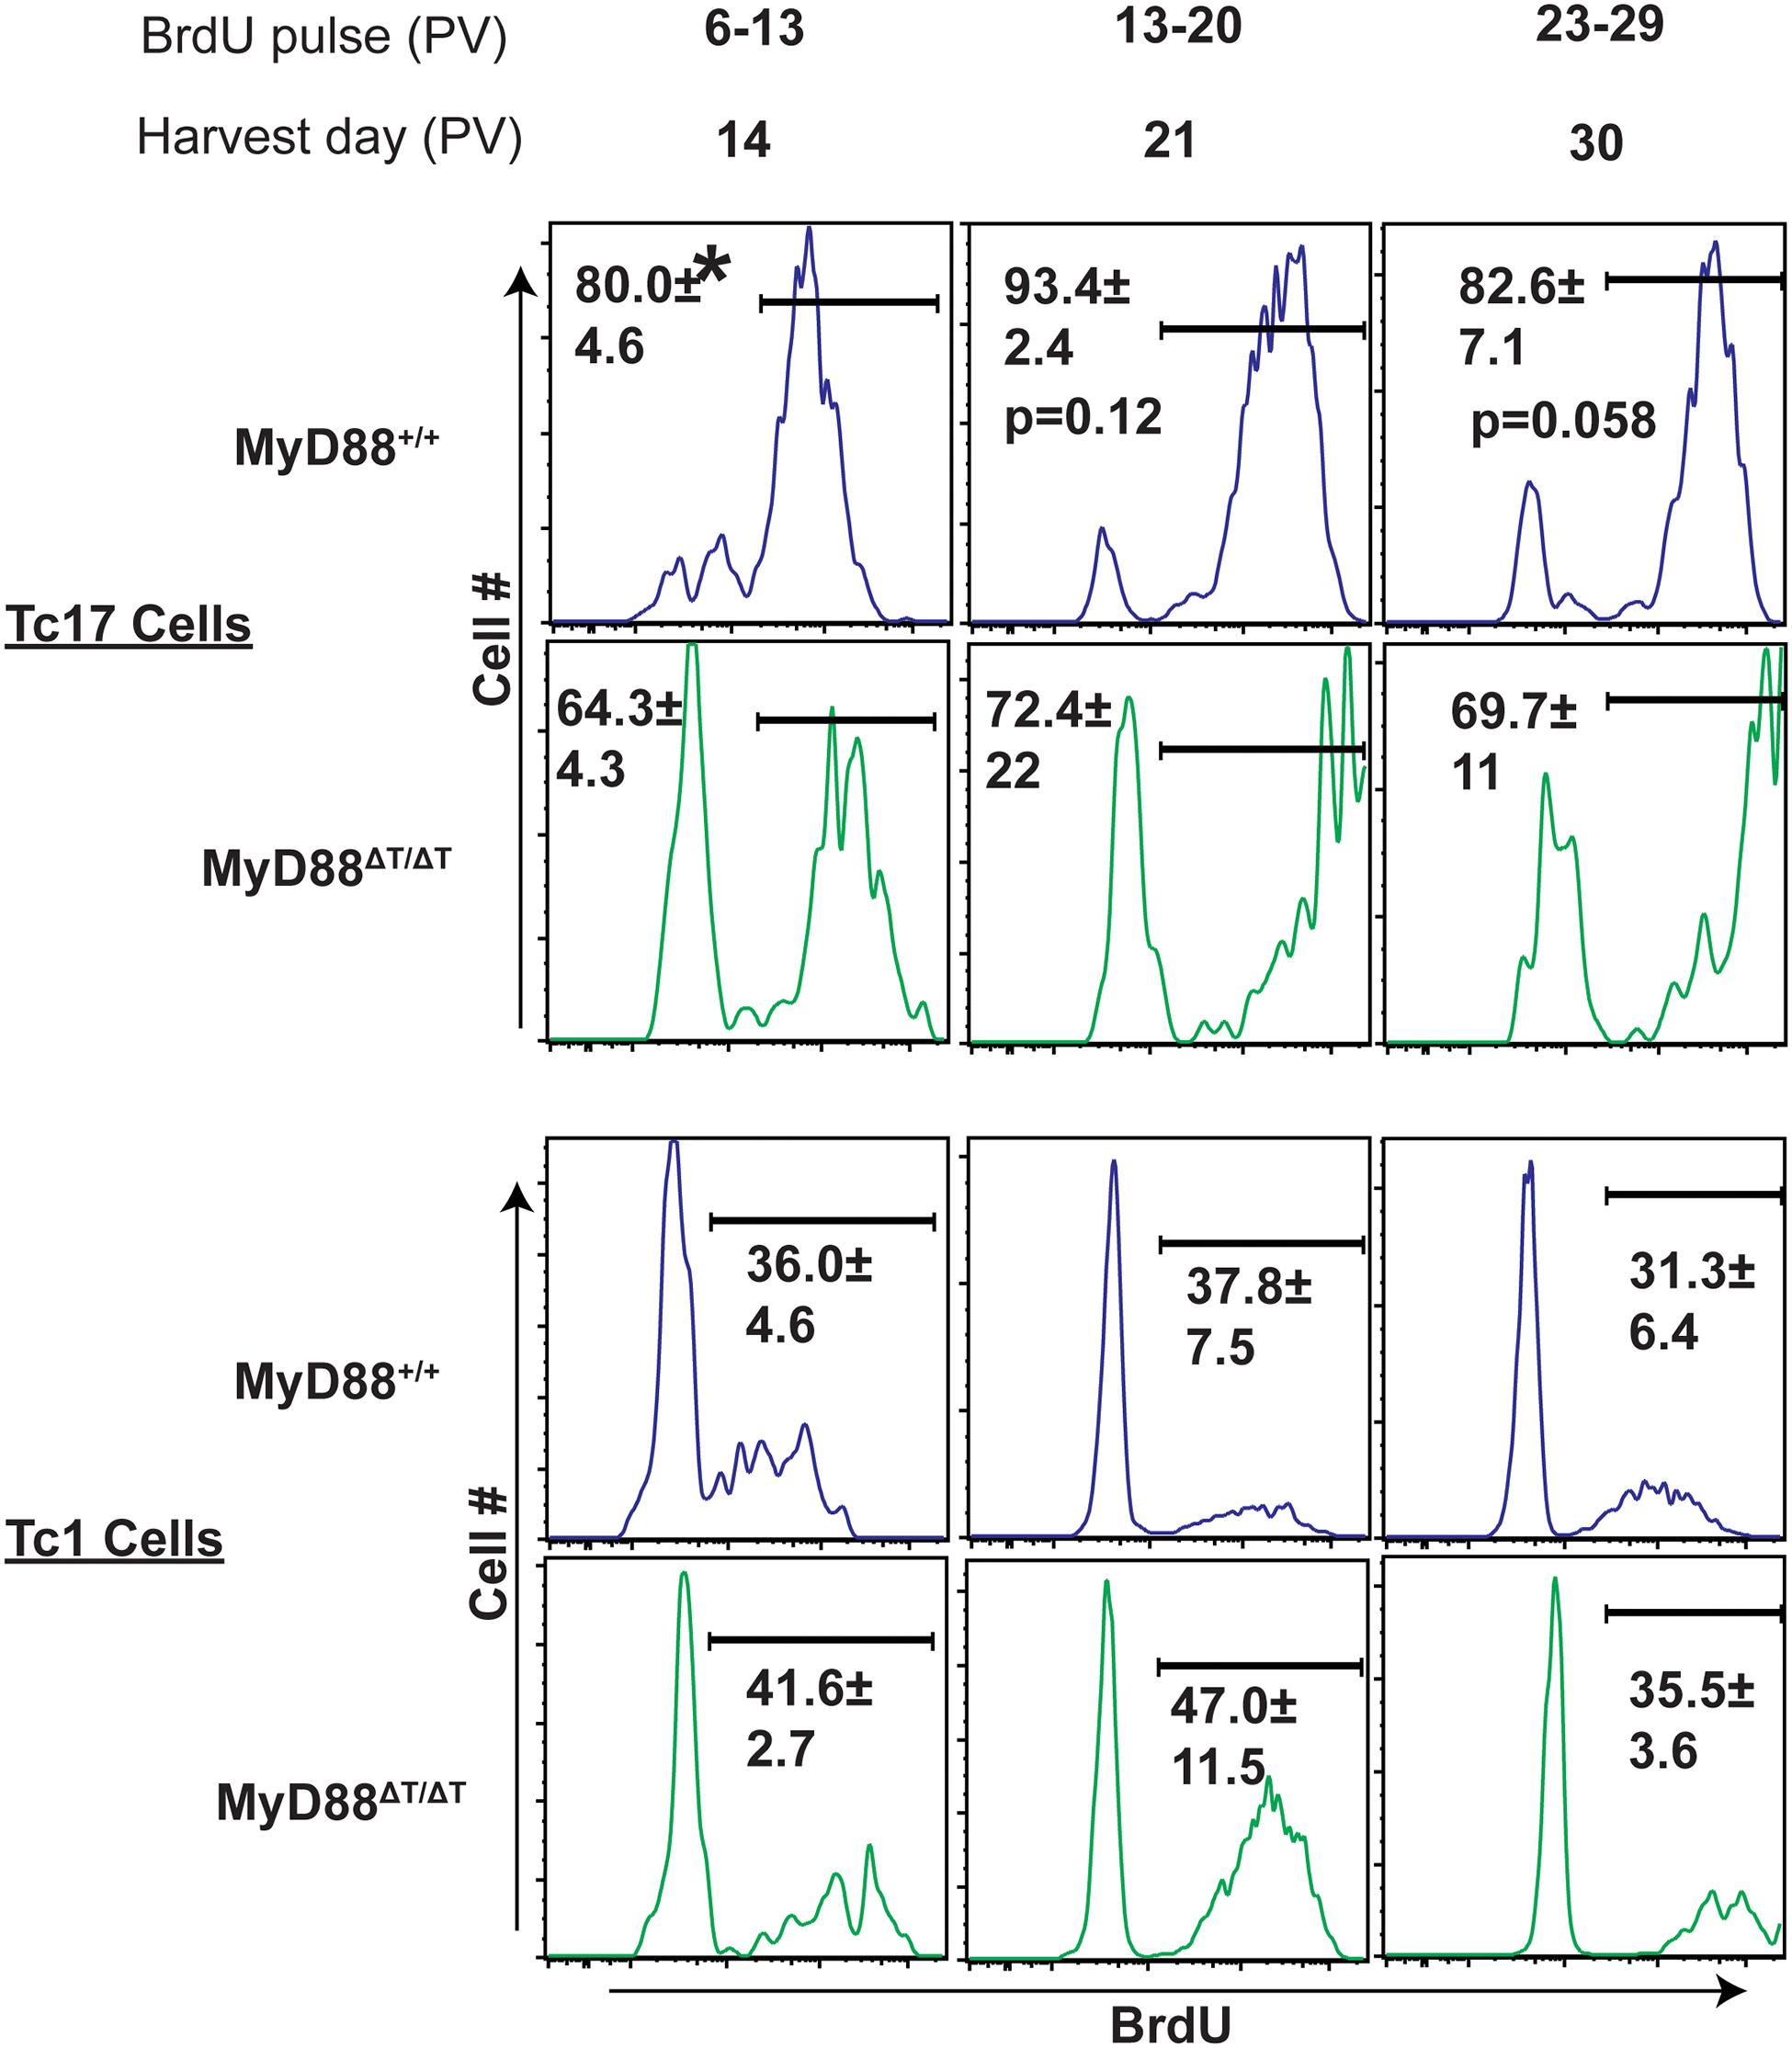 MyD88 signaling potentiates proliferation of Tc17 cells.